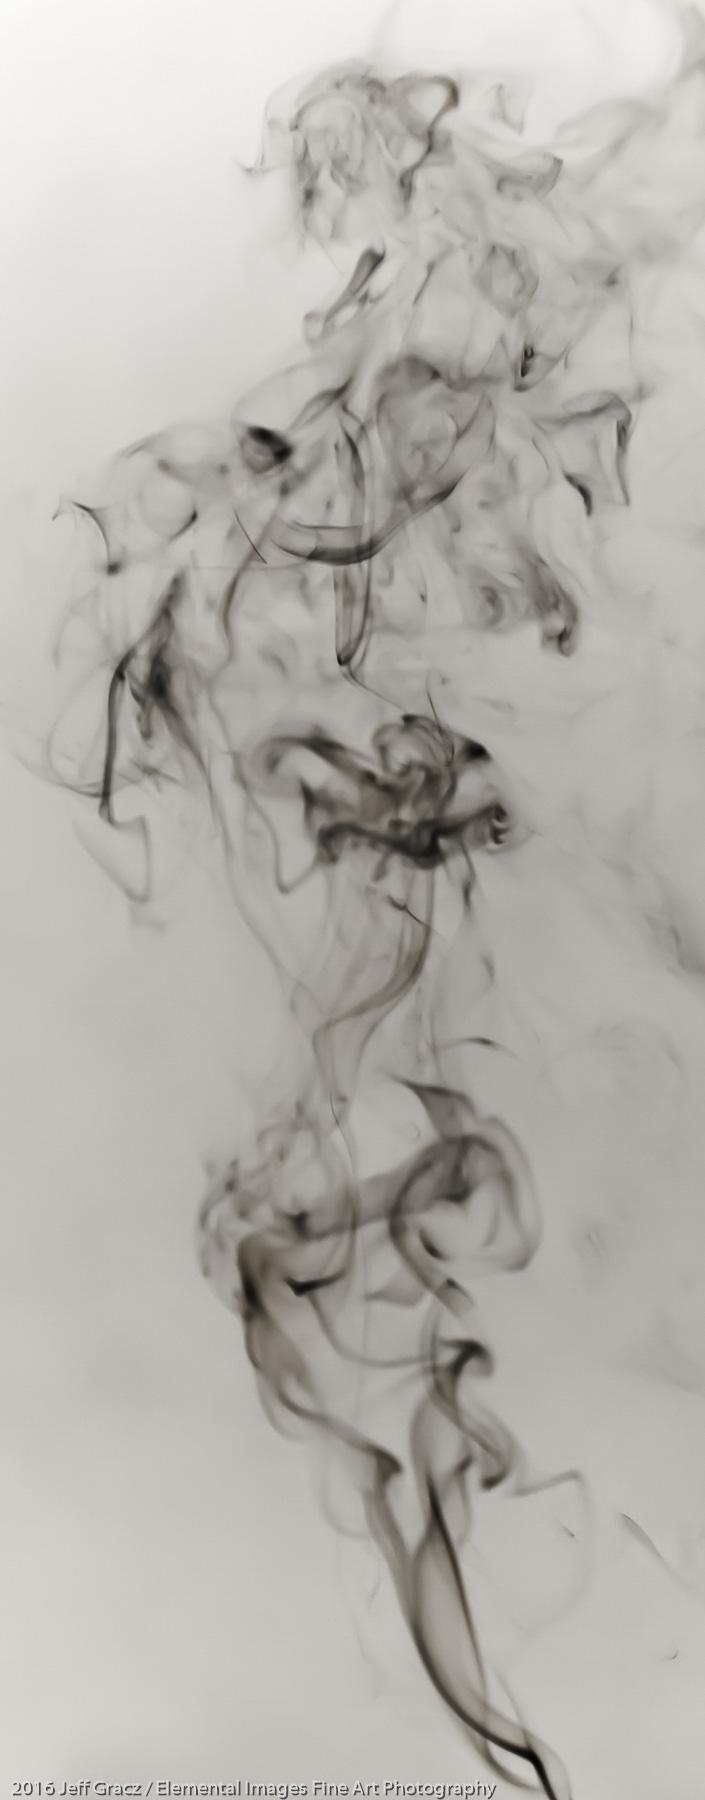 Smoke 21 | Vancouver | WA | USA - © 2016 Jeff Gracz / Elemental Images Fine Art Photography - All Rights Reserved Worldwide